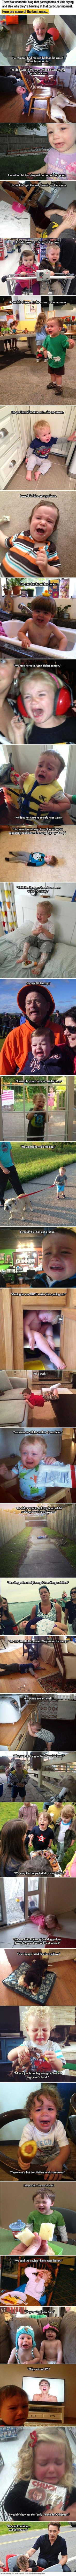 Reasons kids cry...